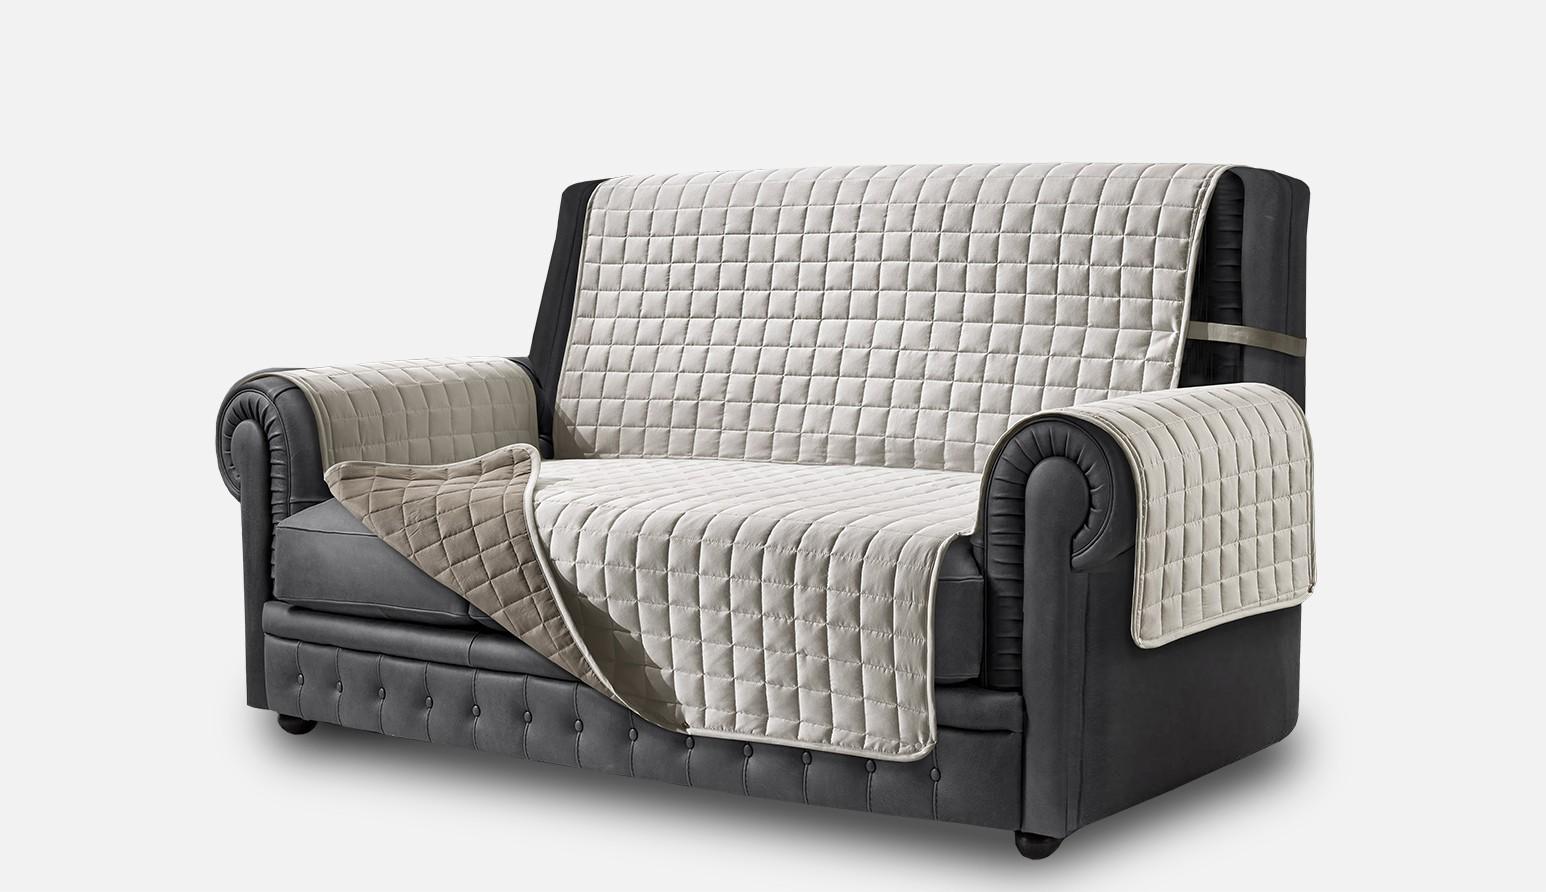 Fundas de sofá alcochados